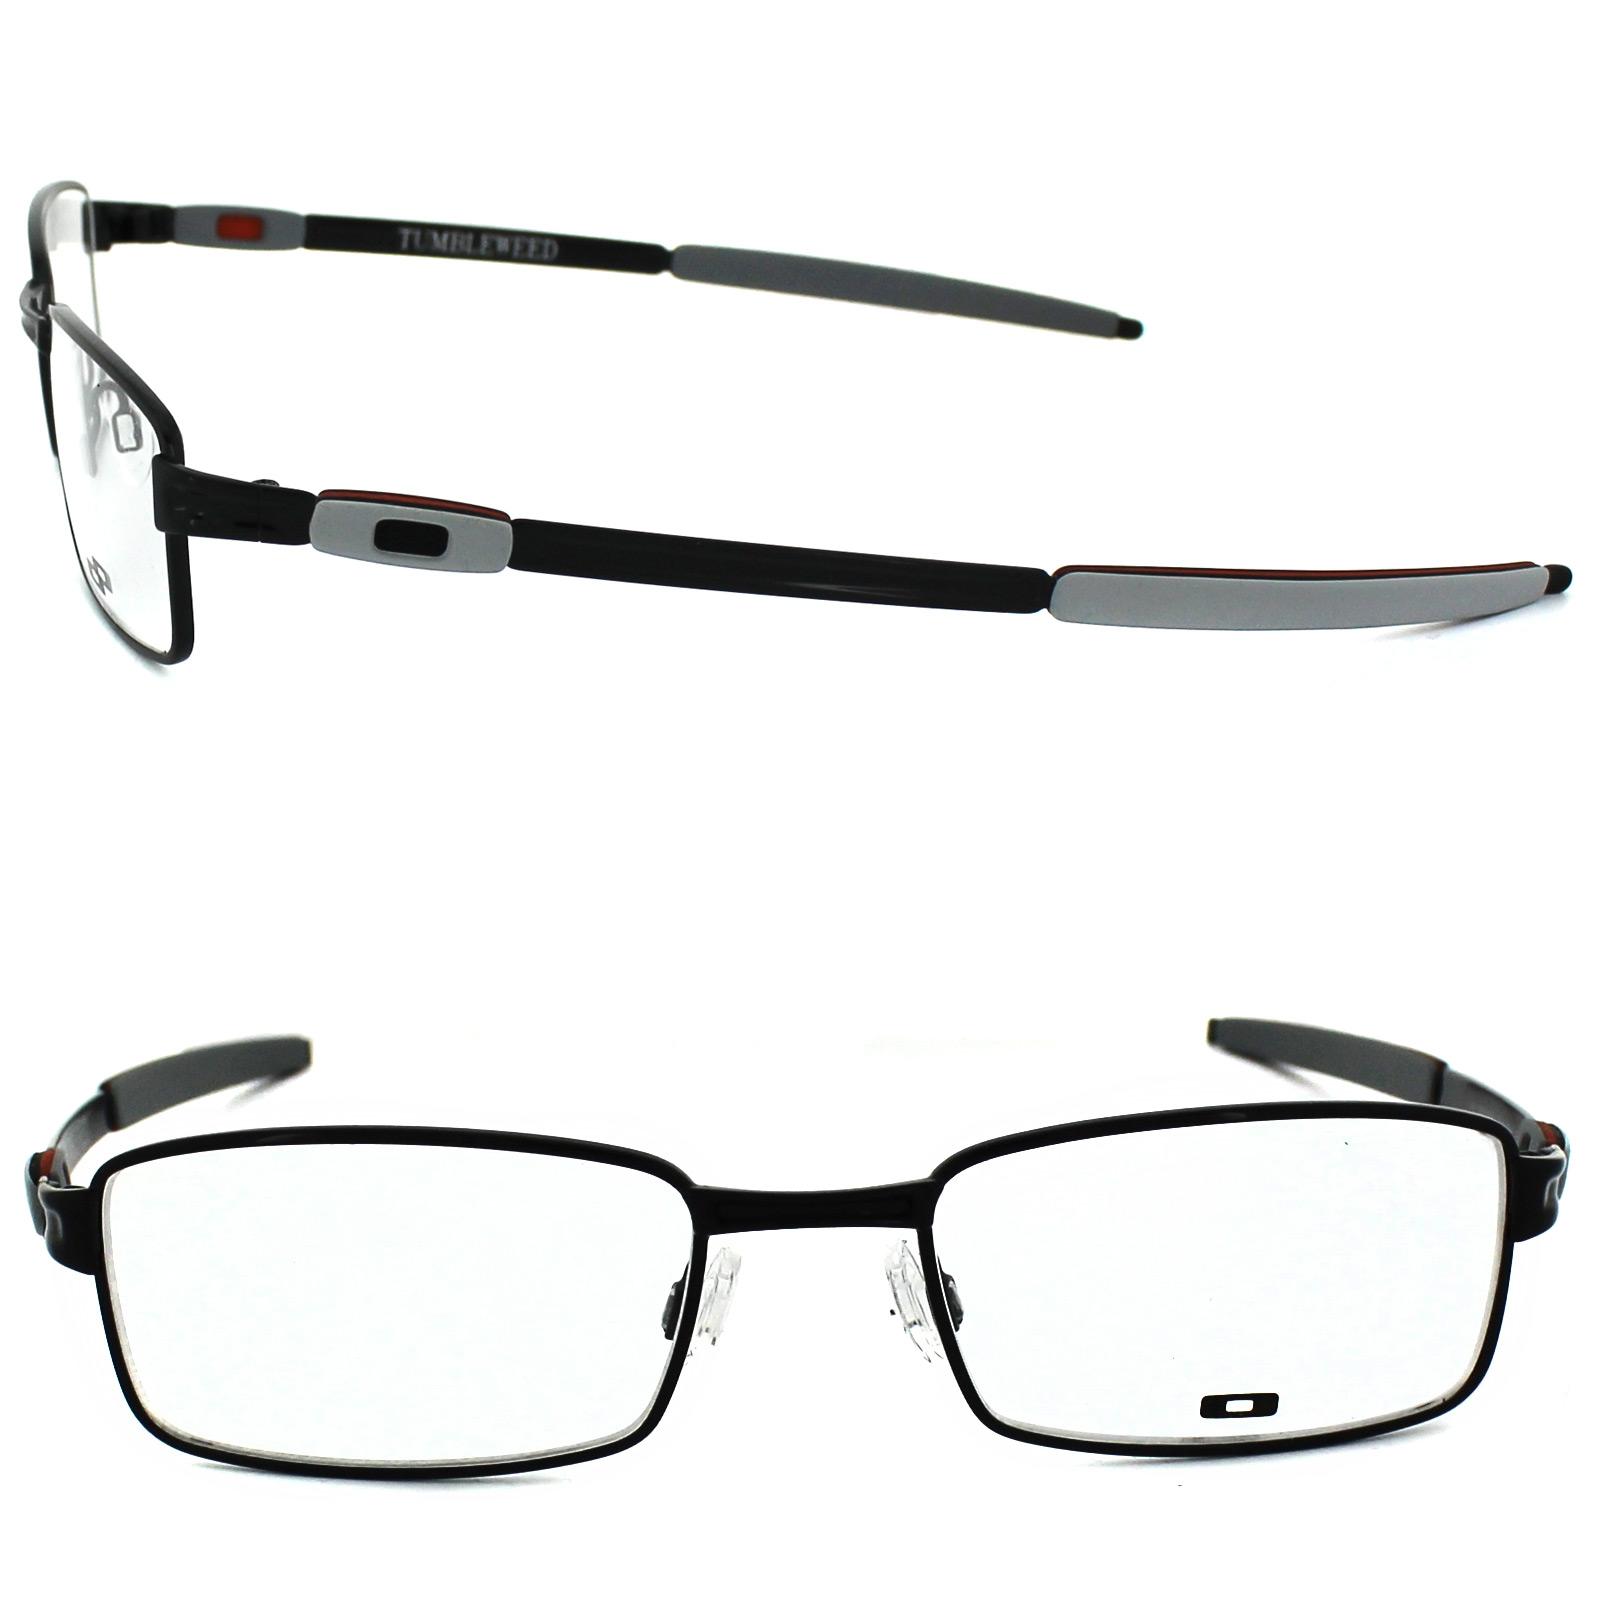 27cd988fbbe1a Oakley Servo Eyeglasses Canada « One More Soul